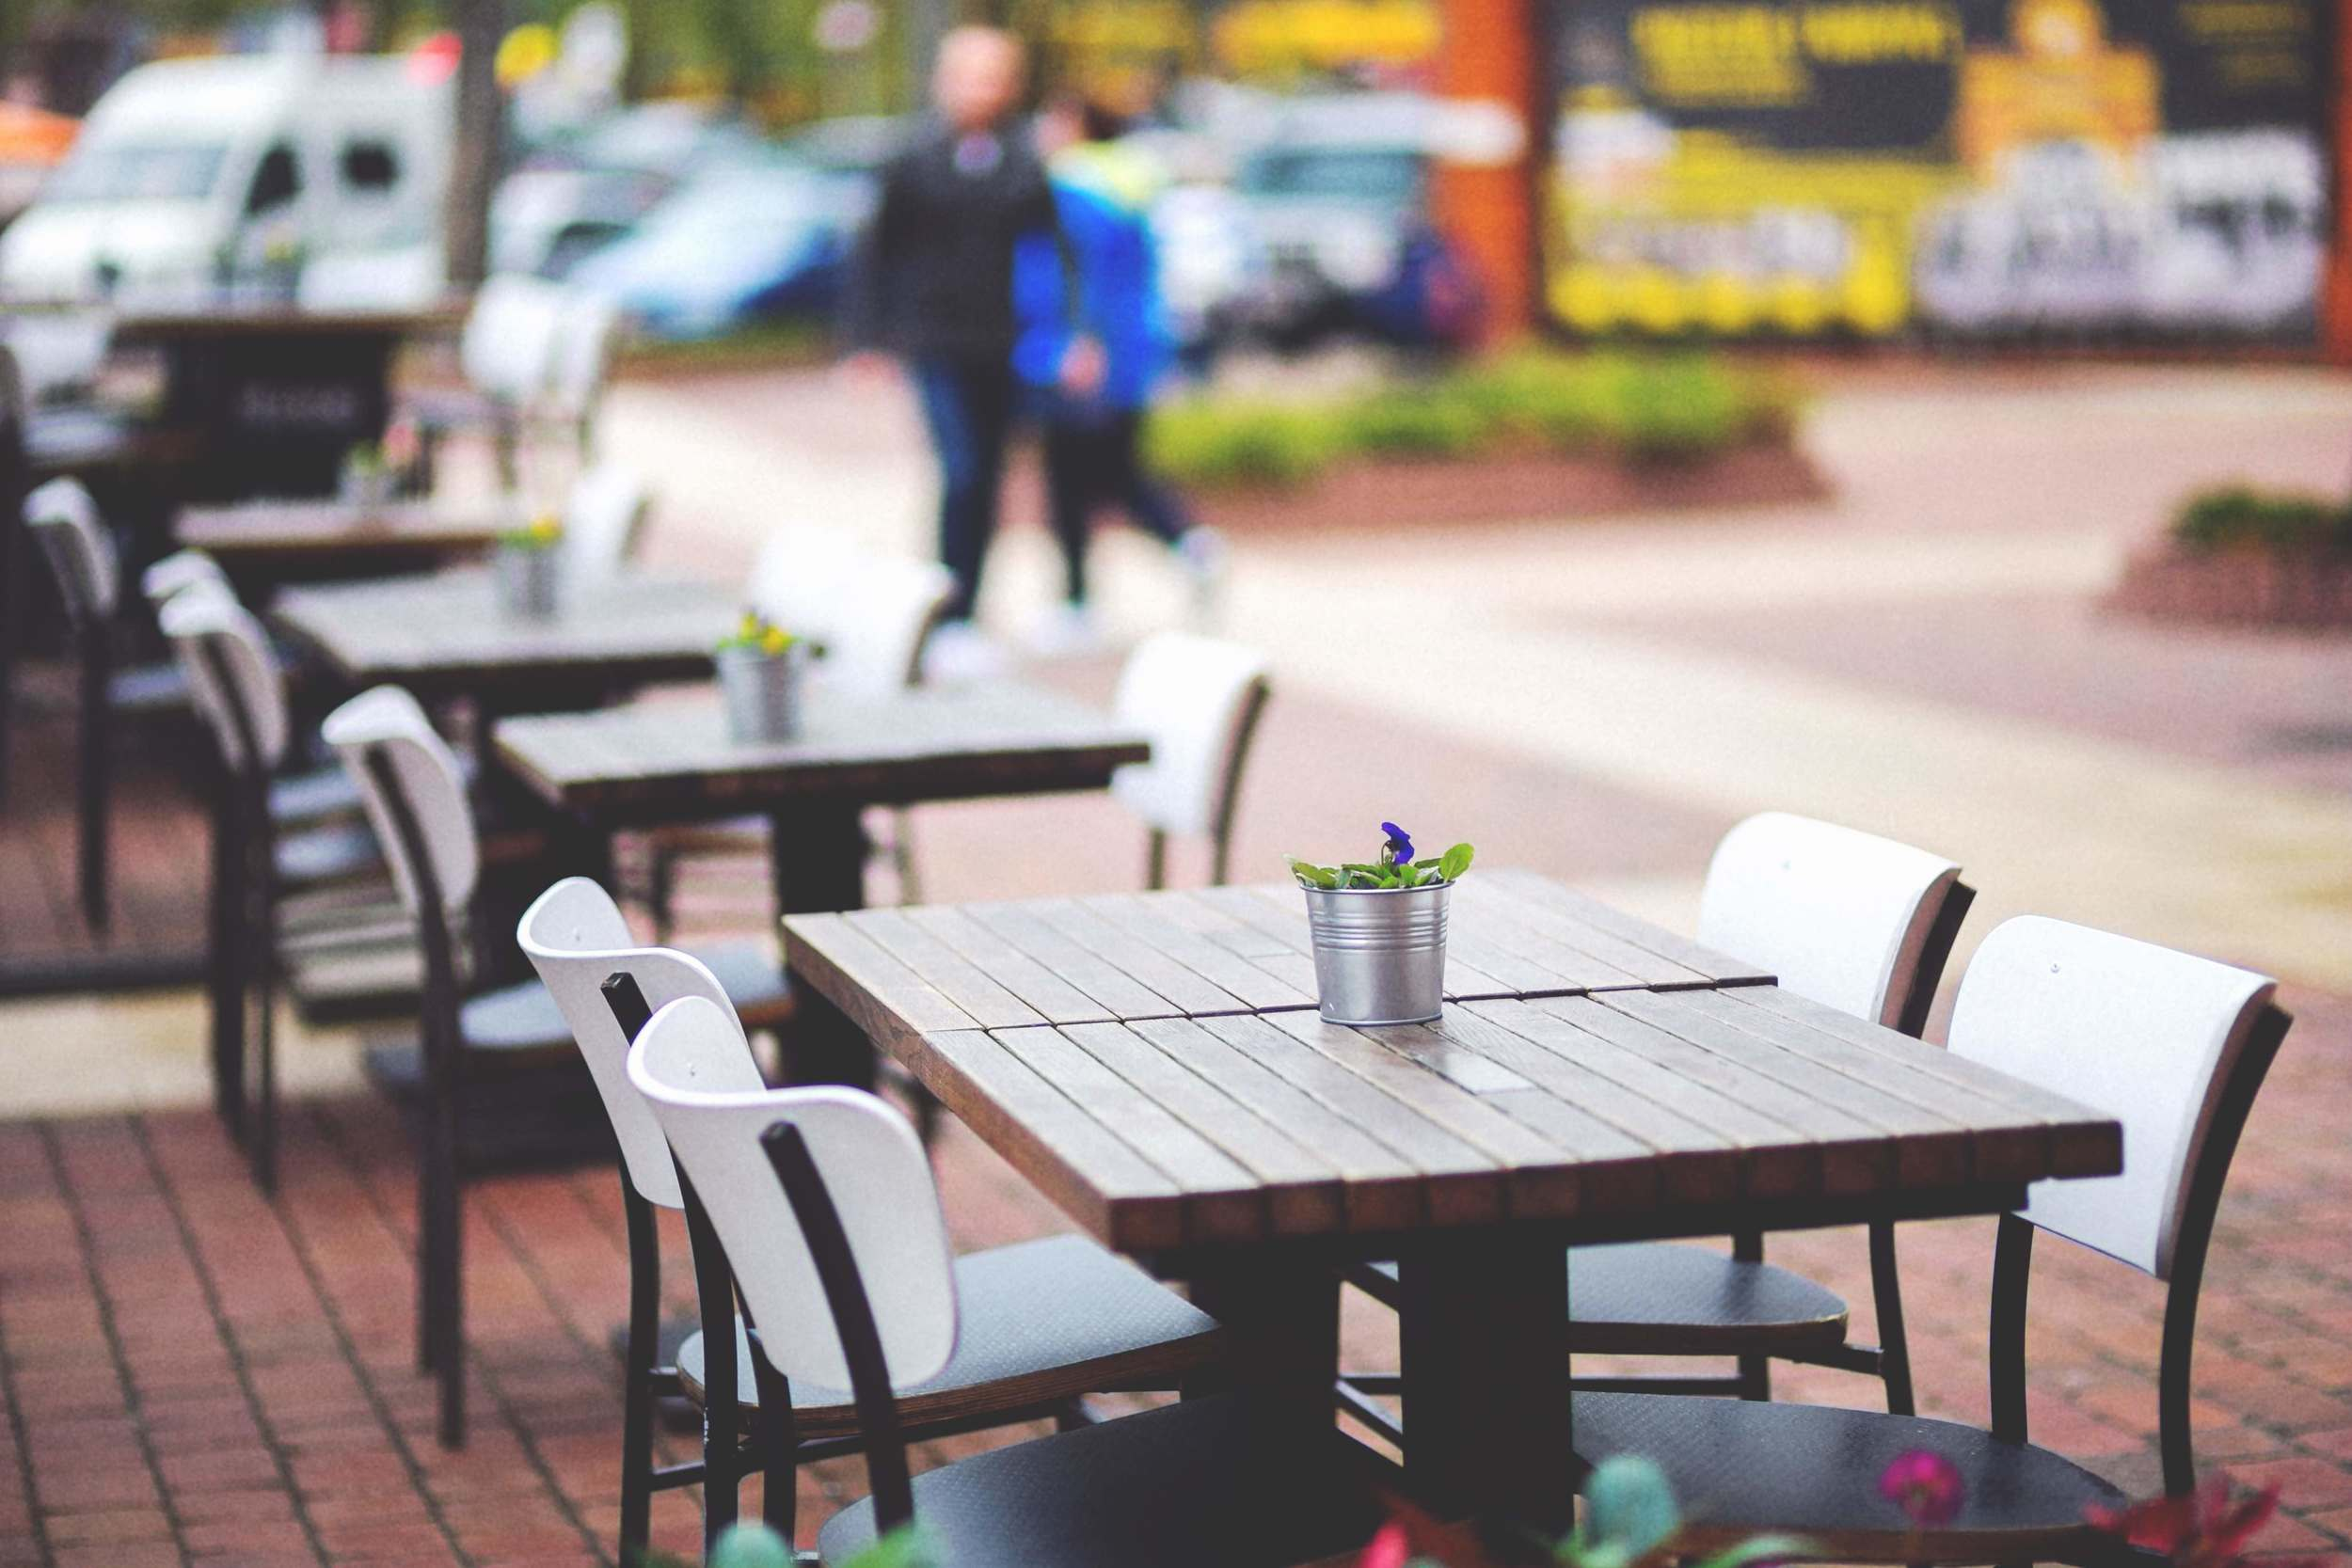 city-restaurant-lunch-outside-copy.jpg